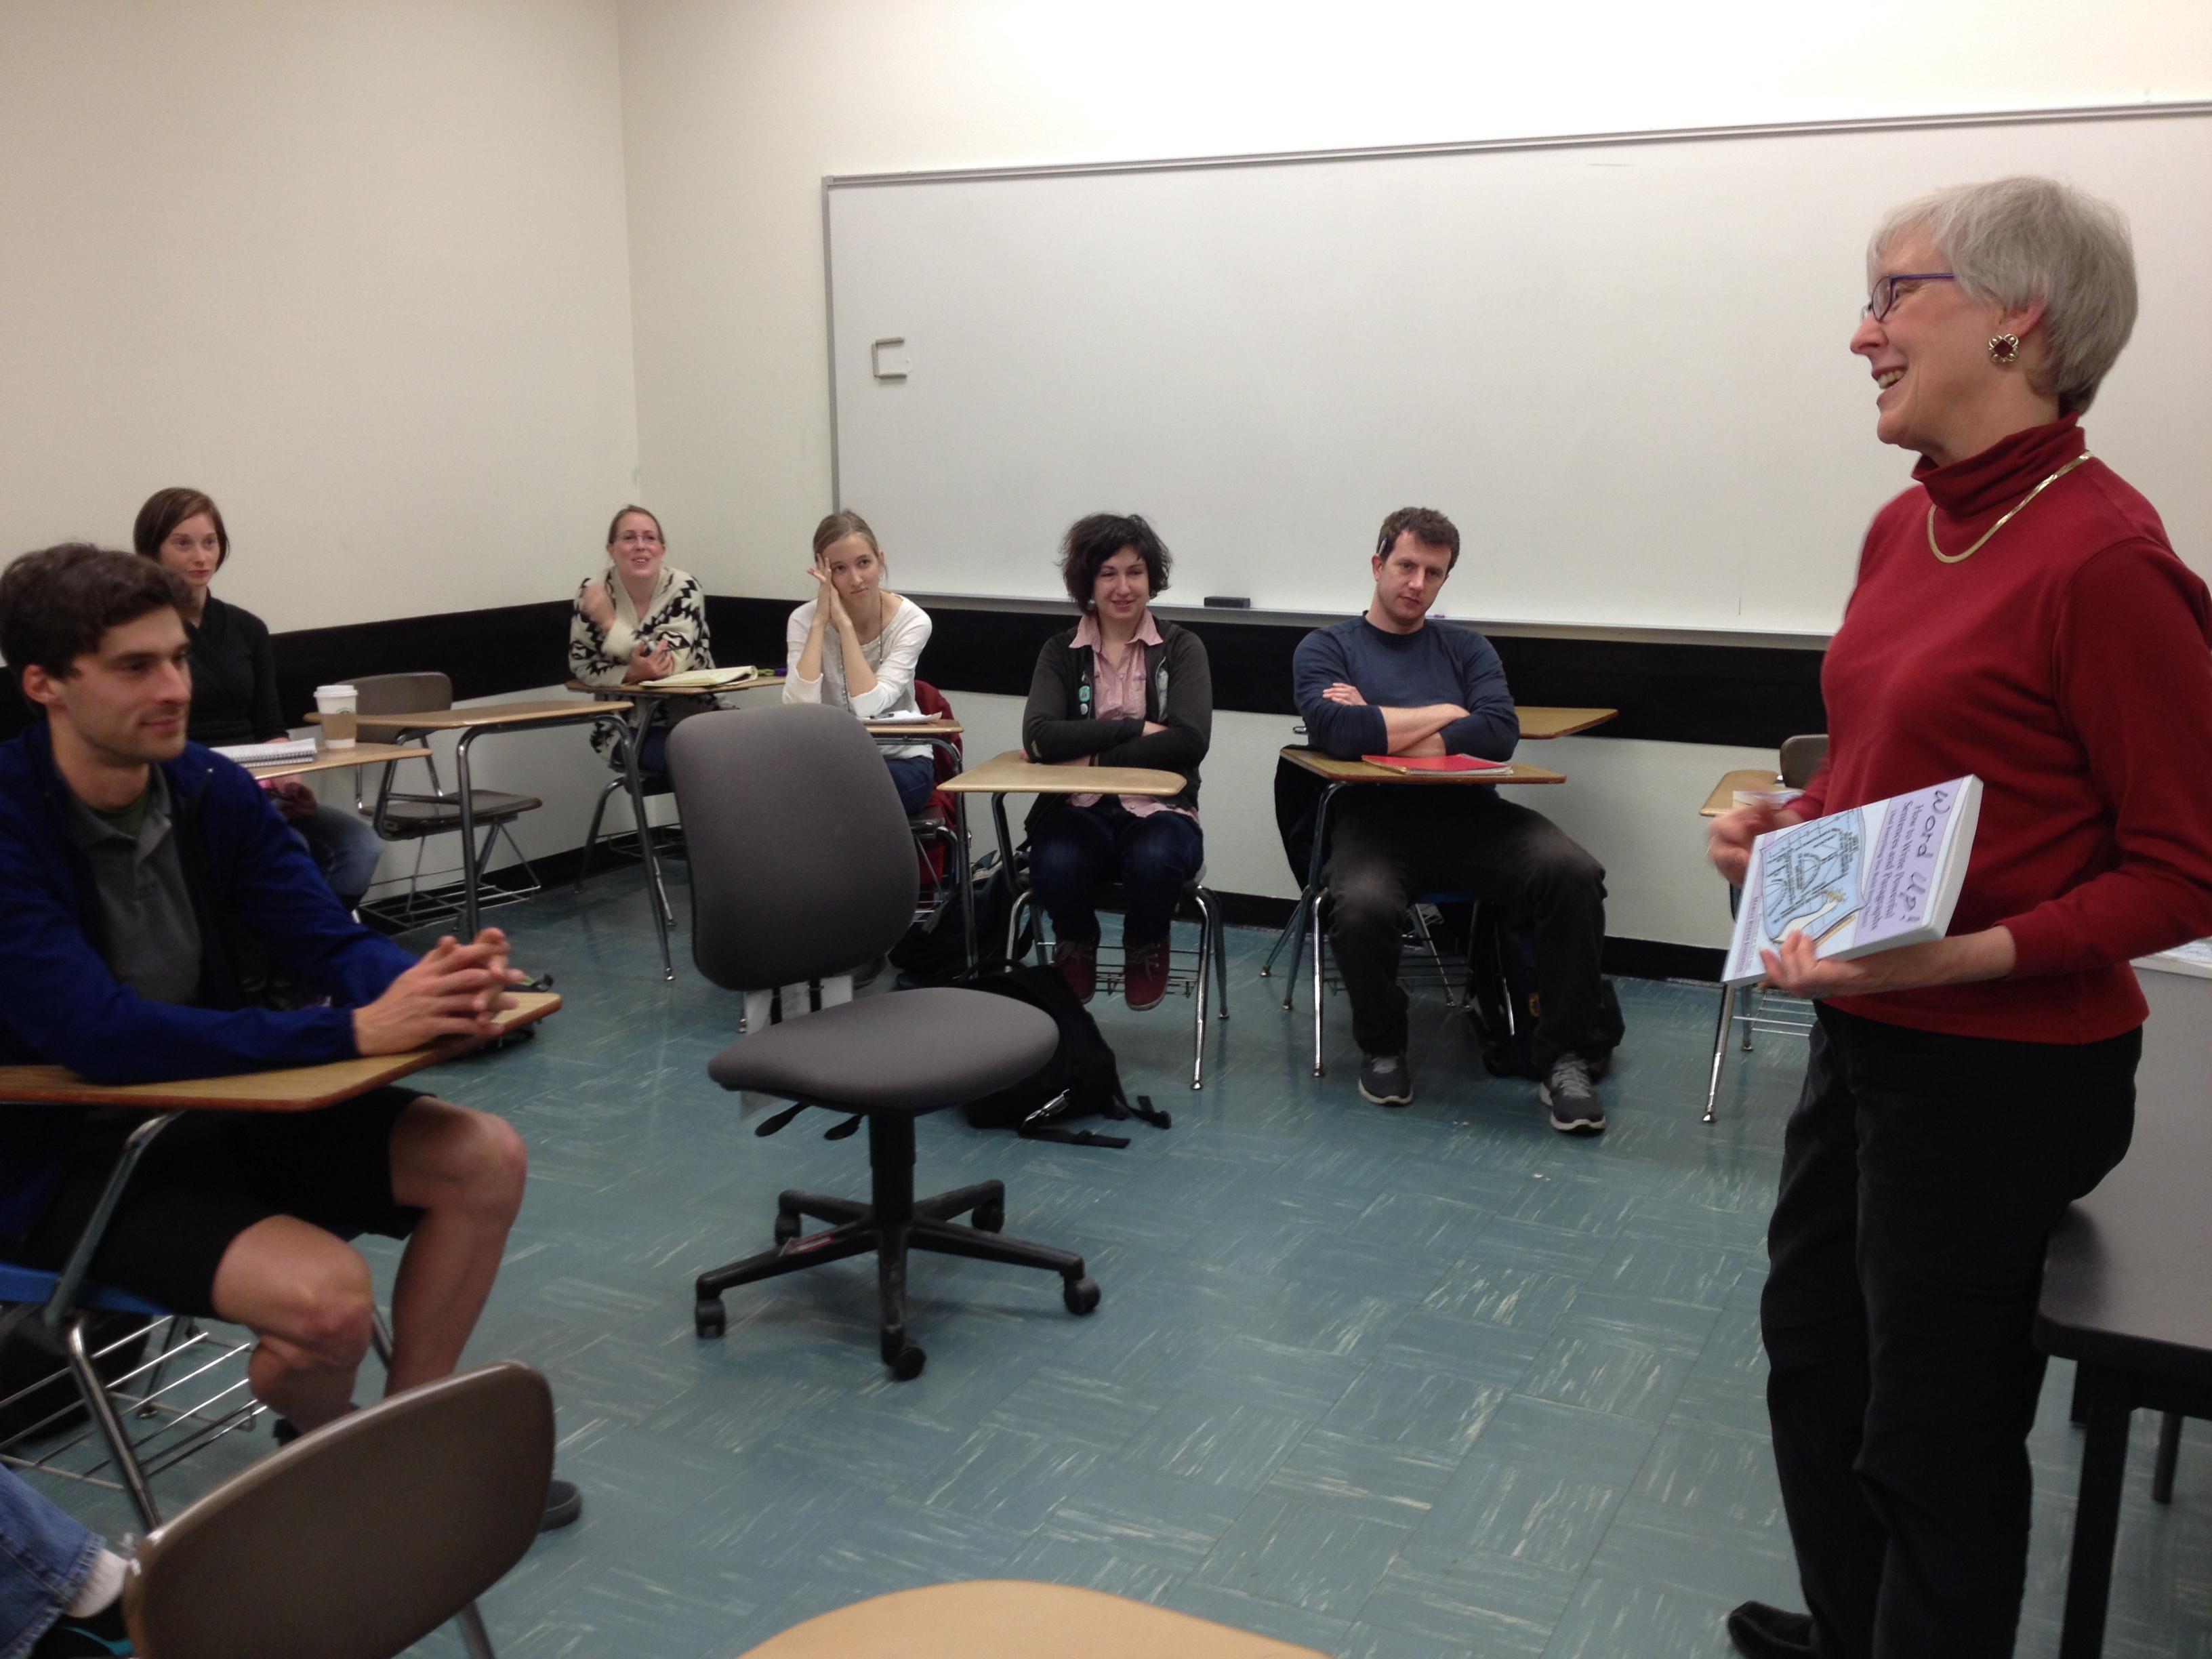 Portland State University class visit